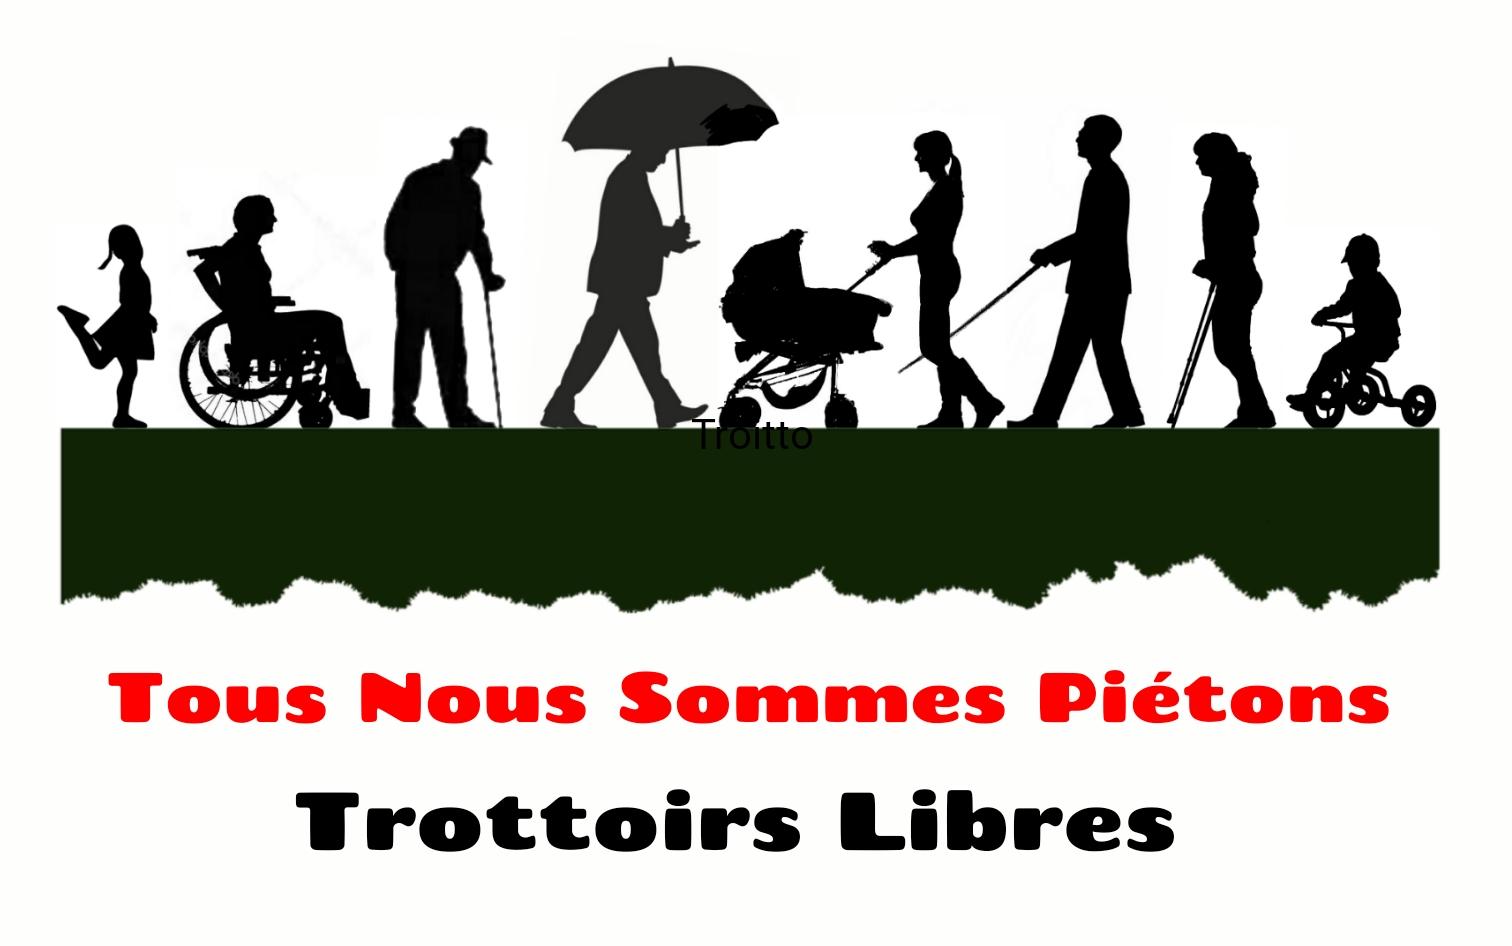 Piétons Trottoirs Estartit Torroella Montgri